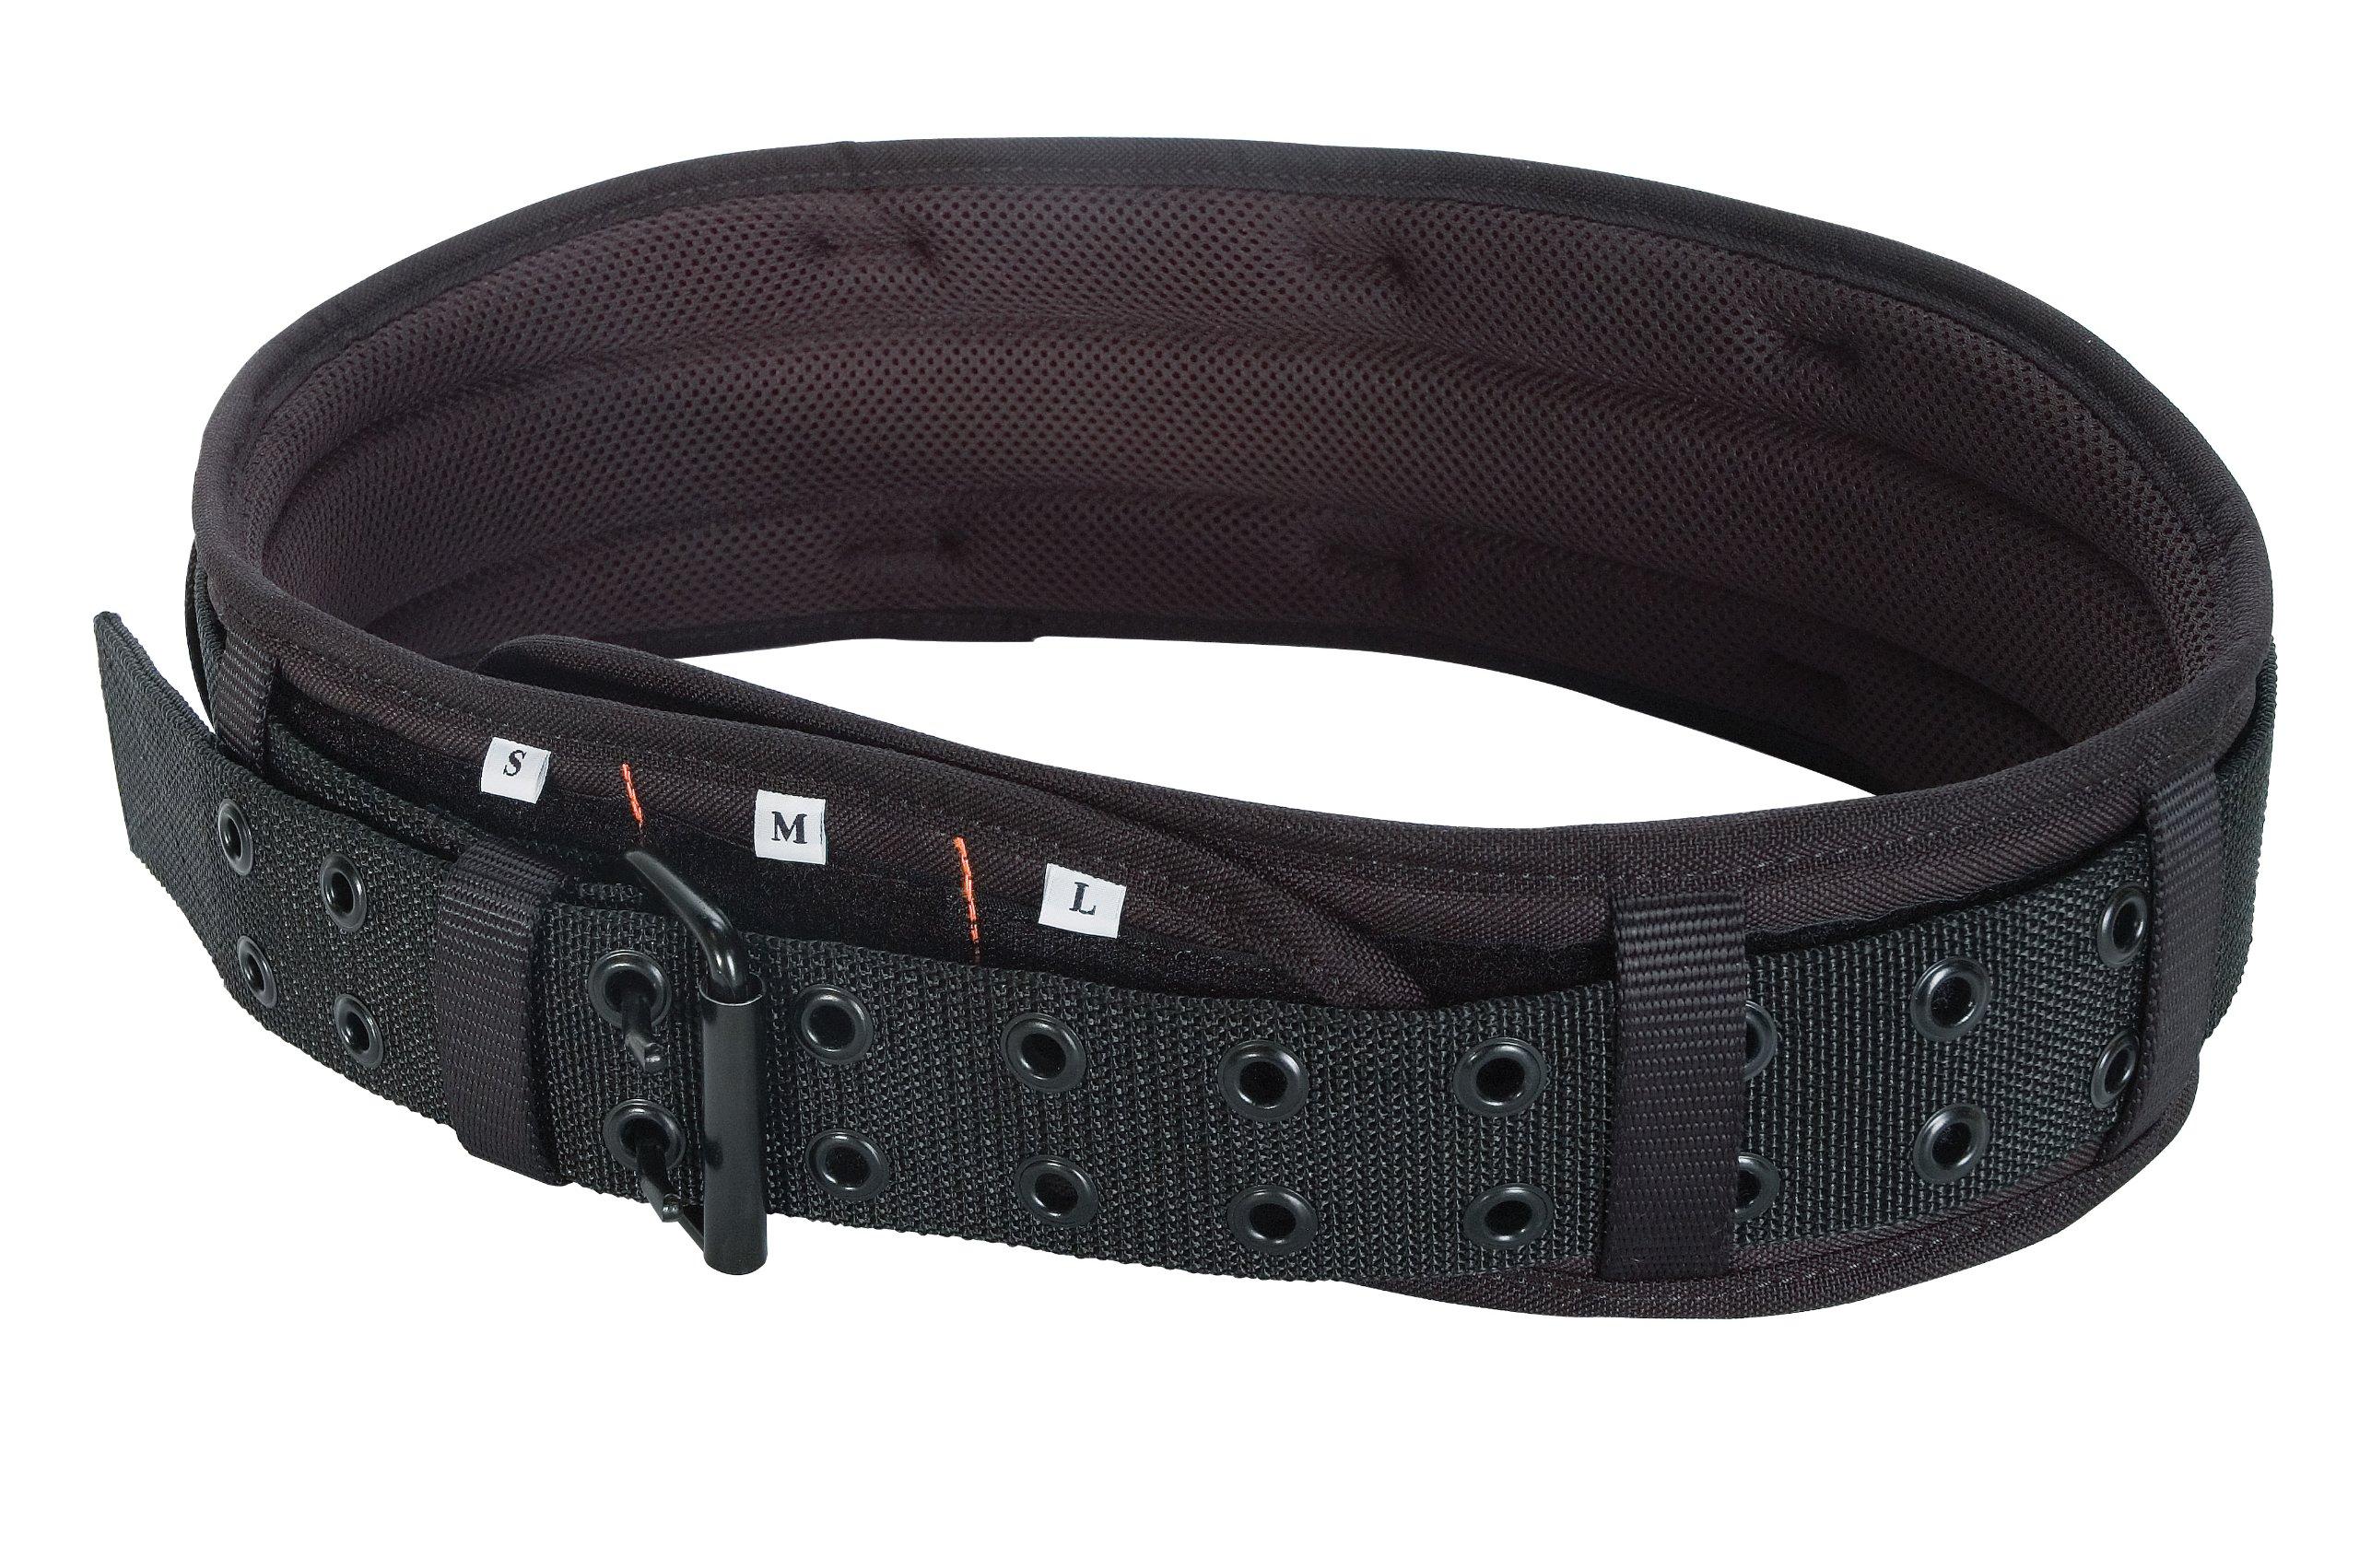 Greenlee 9858-12 Padded Tool Belt, 5'' Wide